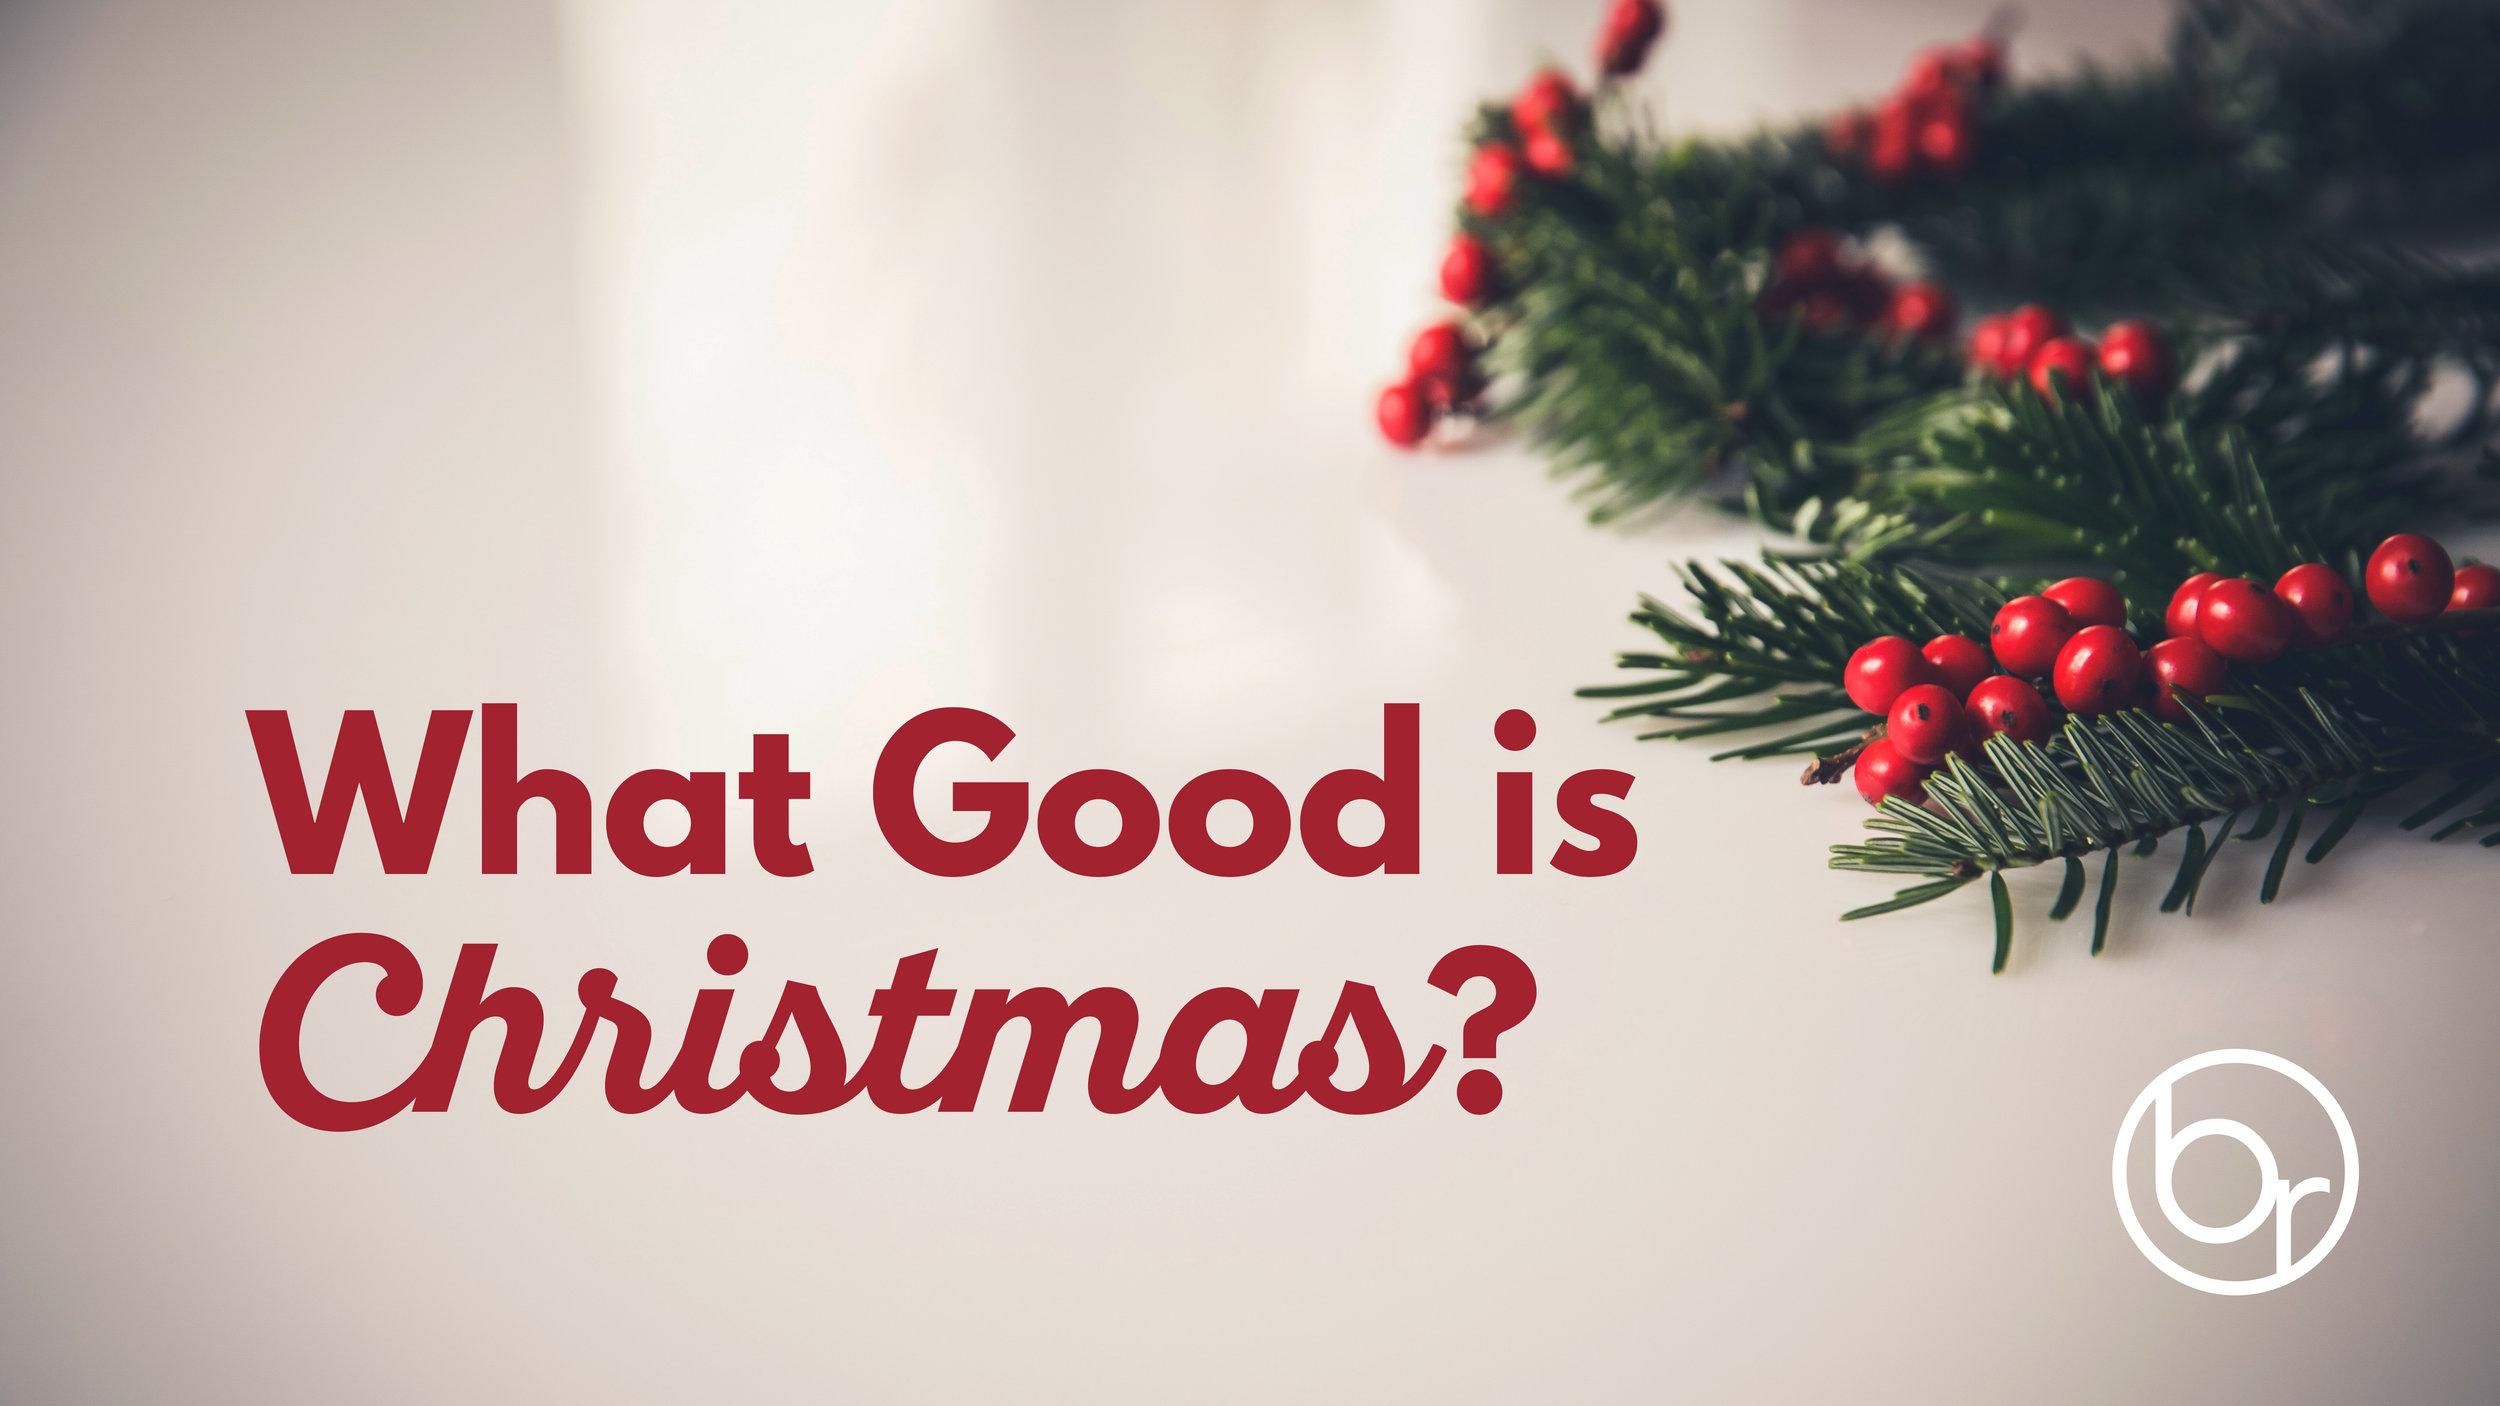 What good Is Christmas_XMAS 2017.jpg